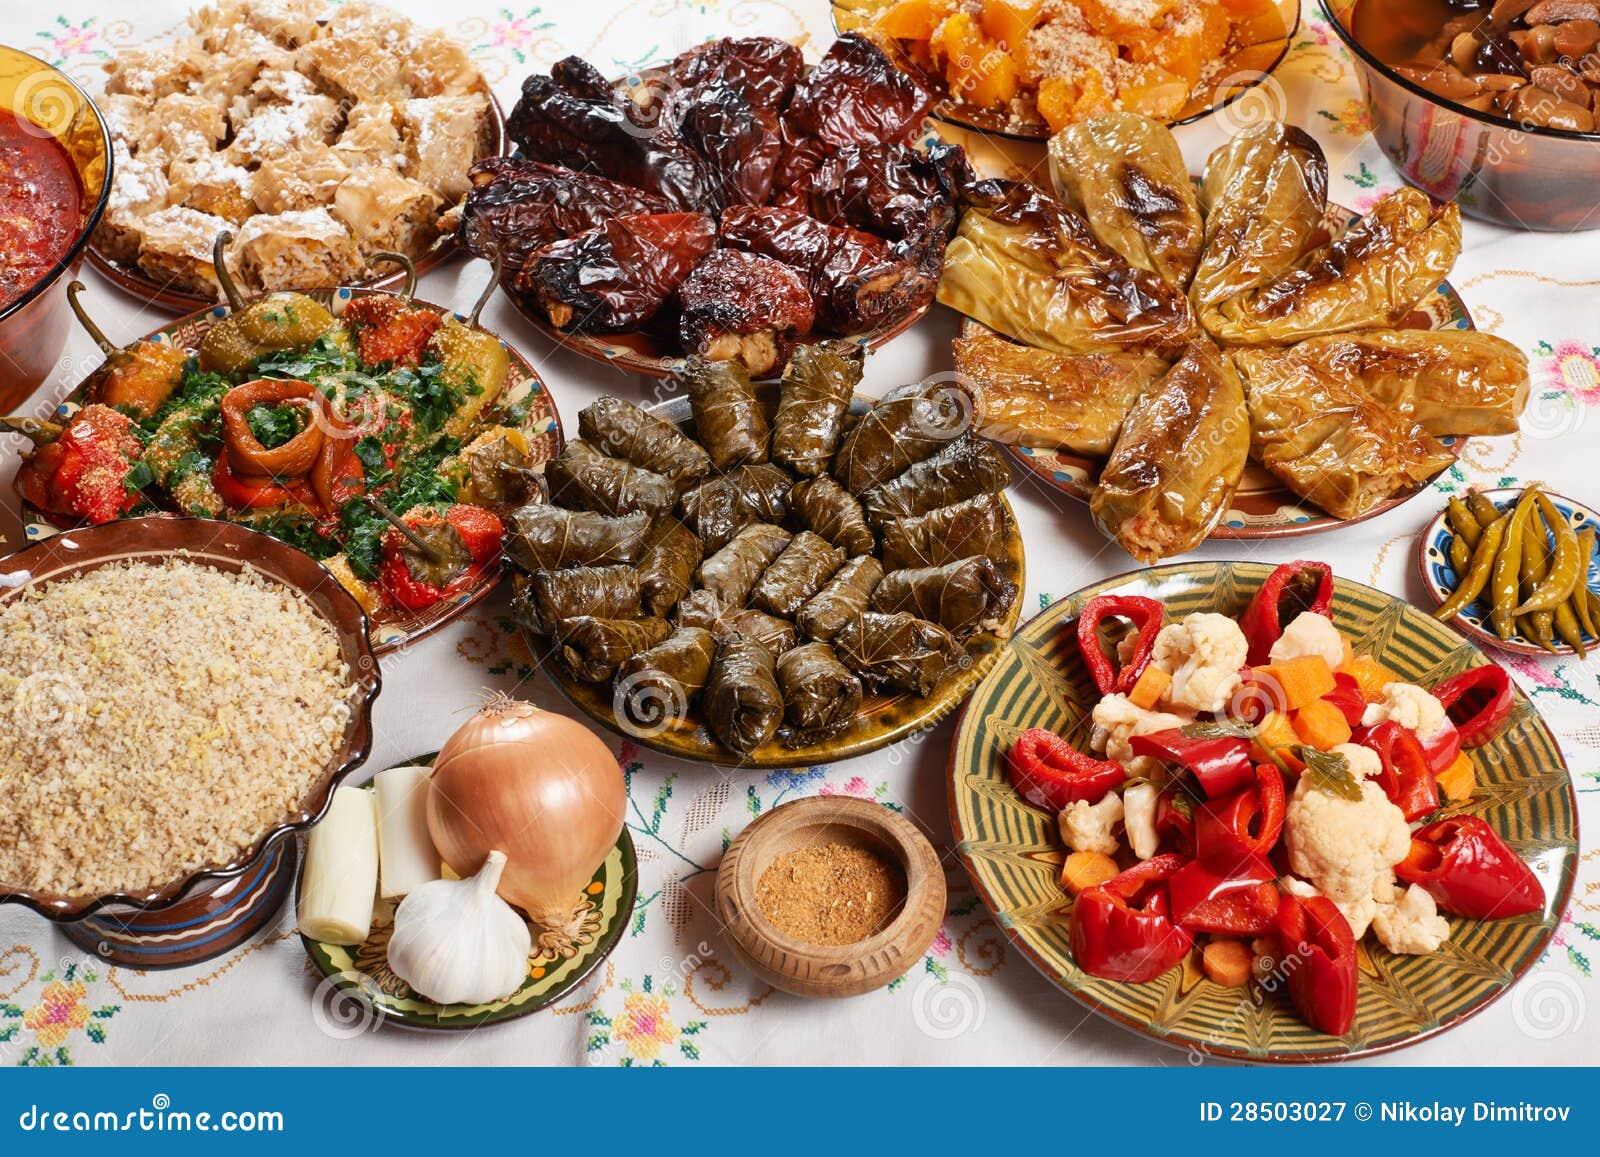 Bulgarian Christmas Food Royalty Free Stock Photography